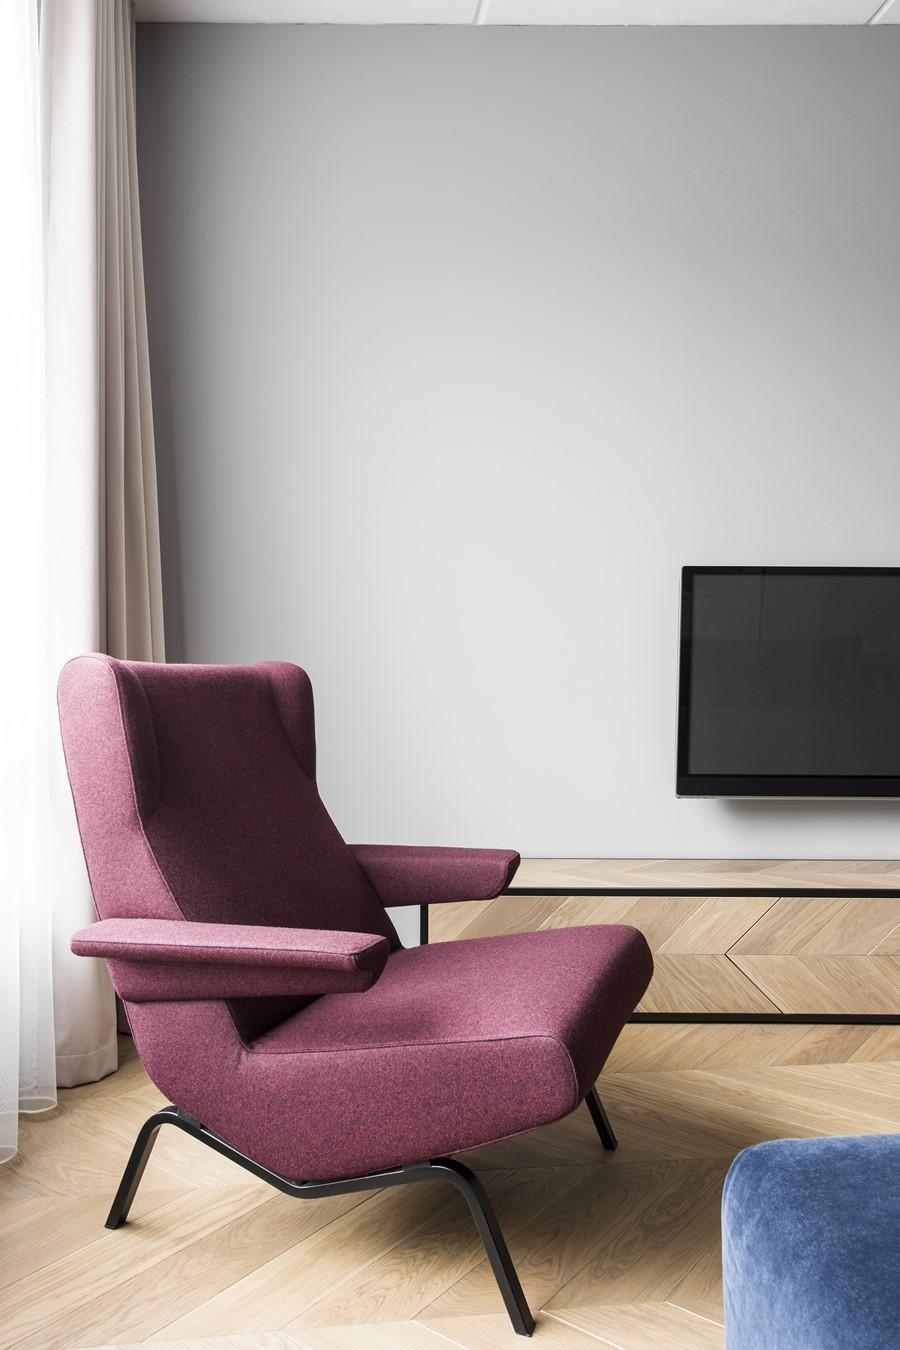 interior-design-by-normundas-vilkas-06